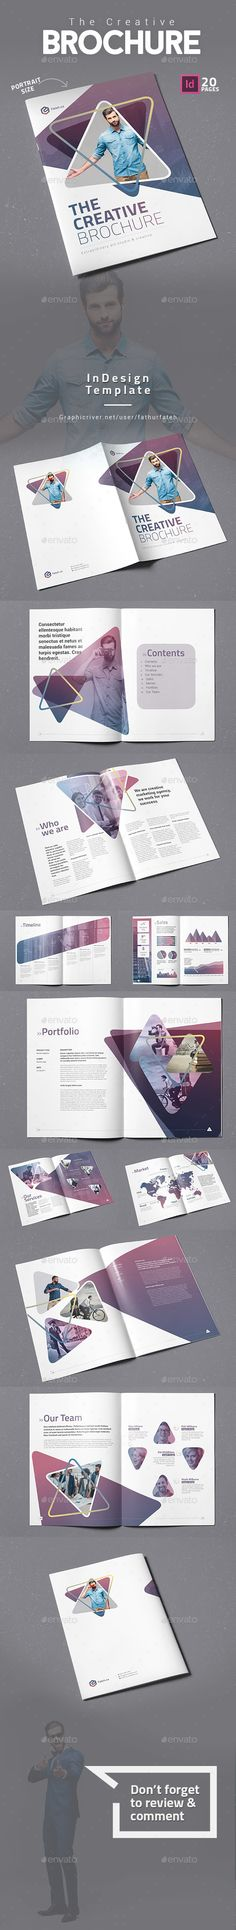 The Creative Brochure Vol.4 #corporate #gradient  • Download here → https://graphicriver.net/item/the-creative-brochure-vol3/21117375?ref=pxcr